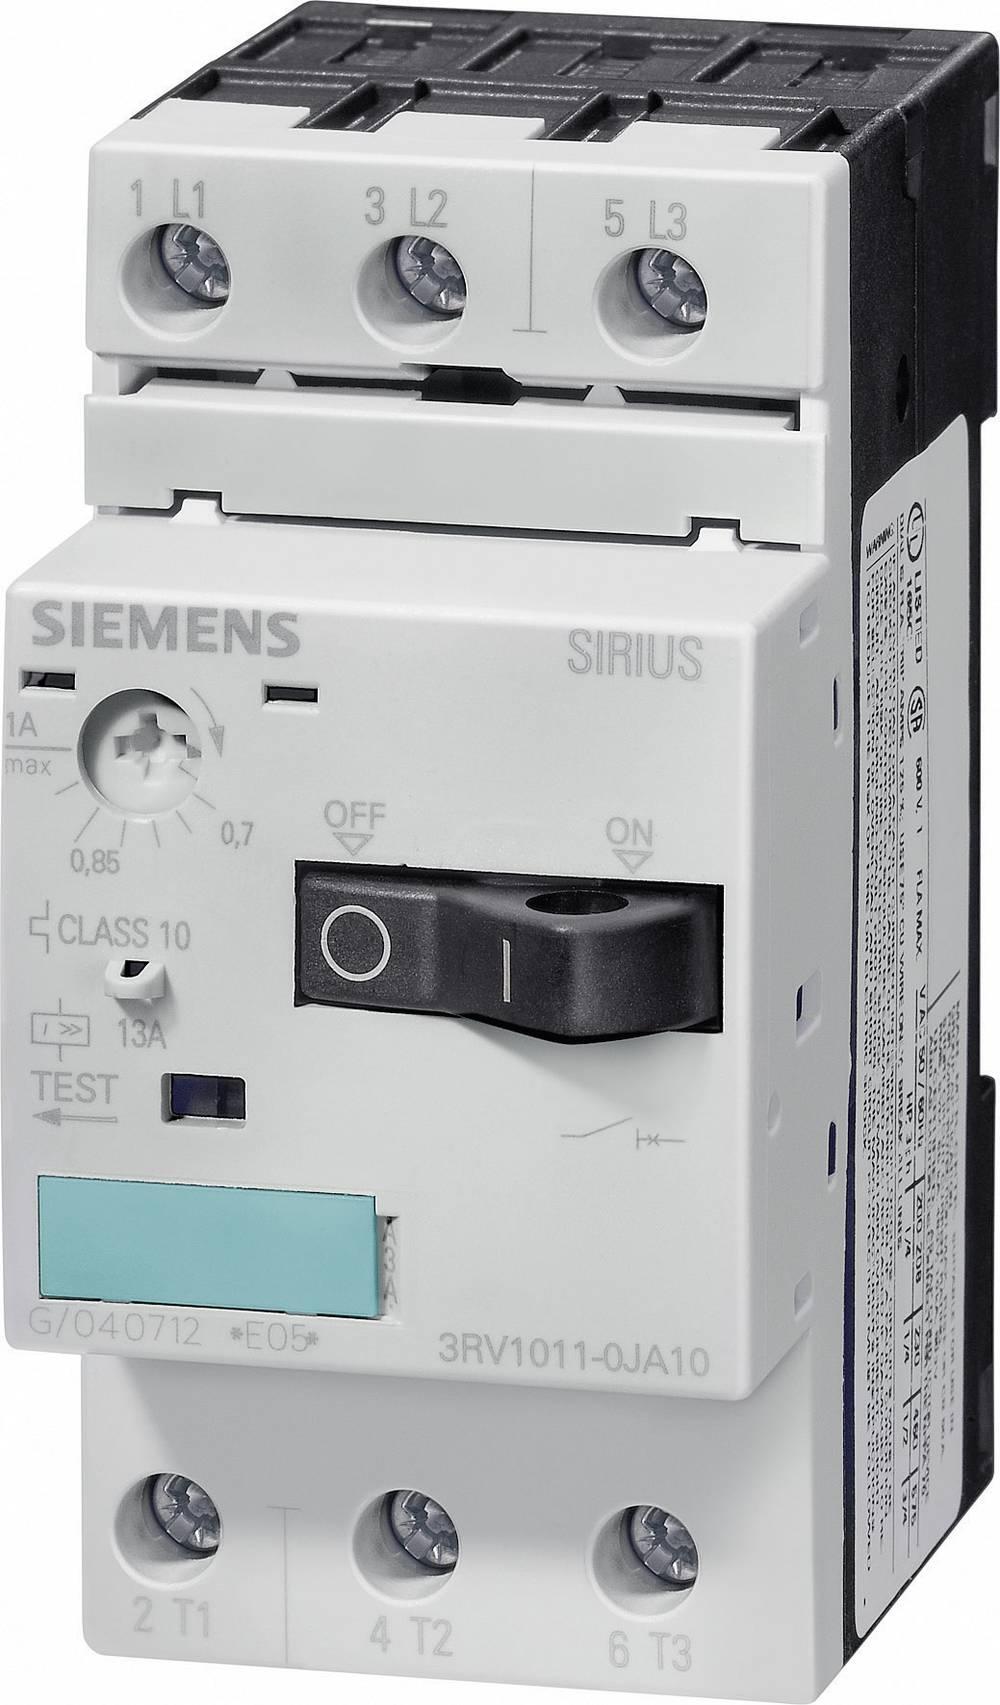 Snažan prekidač 1 kom. Siemens 3RV1011-1KA10 3 zatvarač, postavljanje (struja): 9 - 12 A preklopni napon (maks.): 690 V/AC (Š x